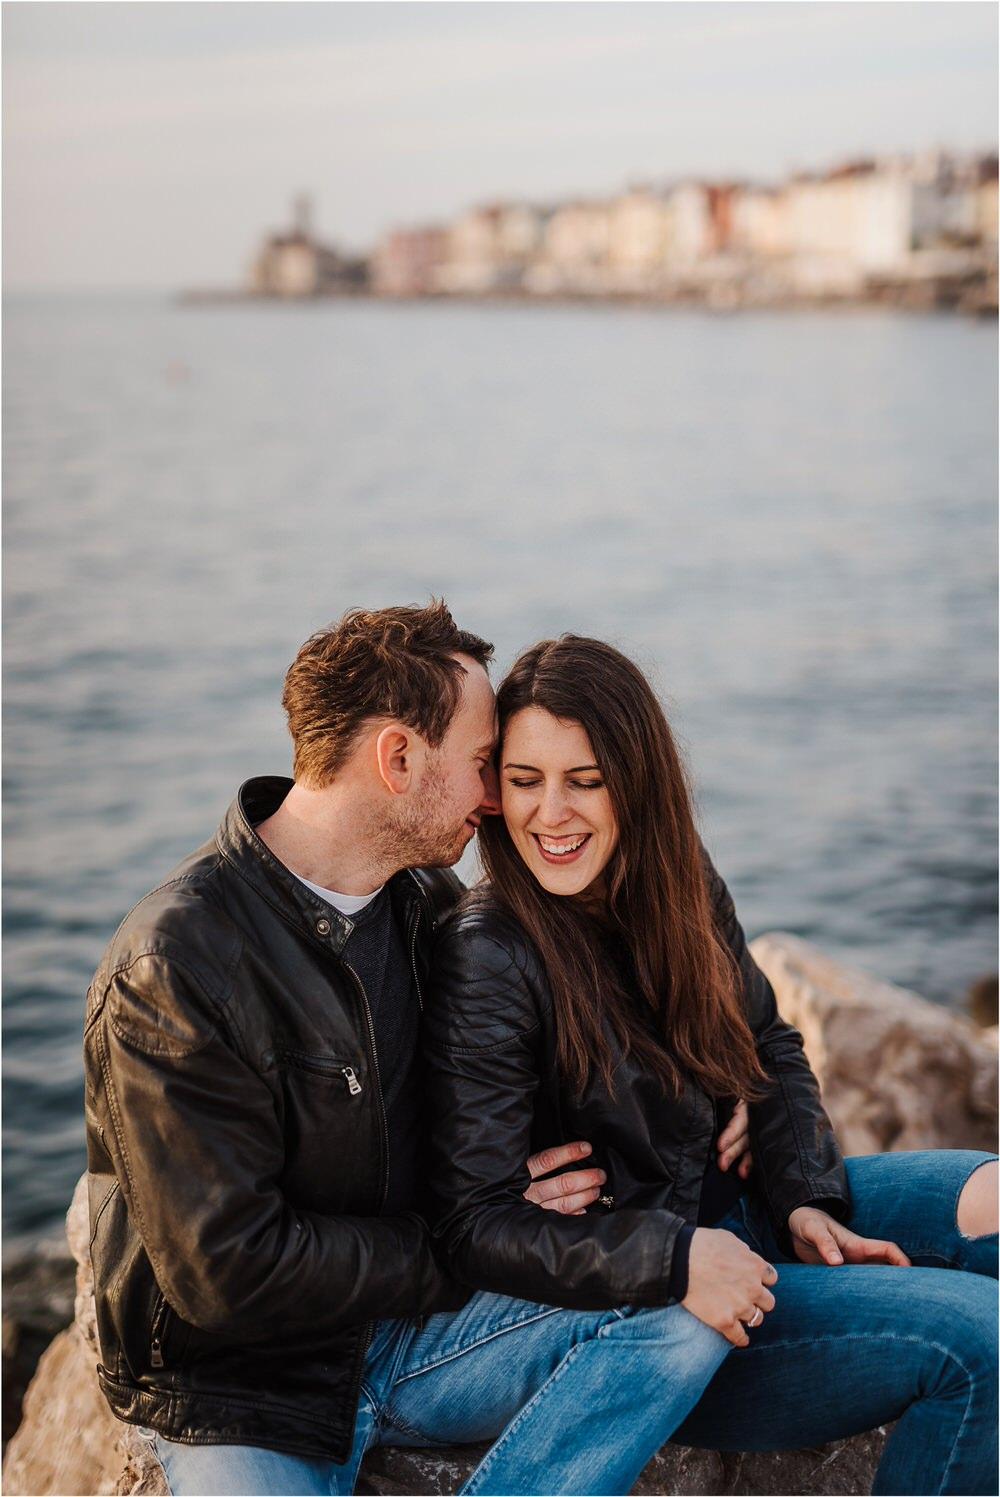 piran slovenia engagement phtoographer session photography slovenia seaside beach wedding elopement 0028.jpg